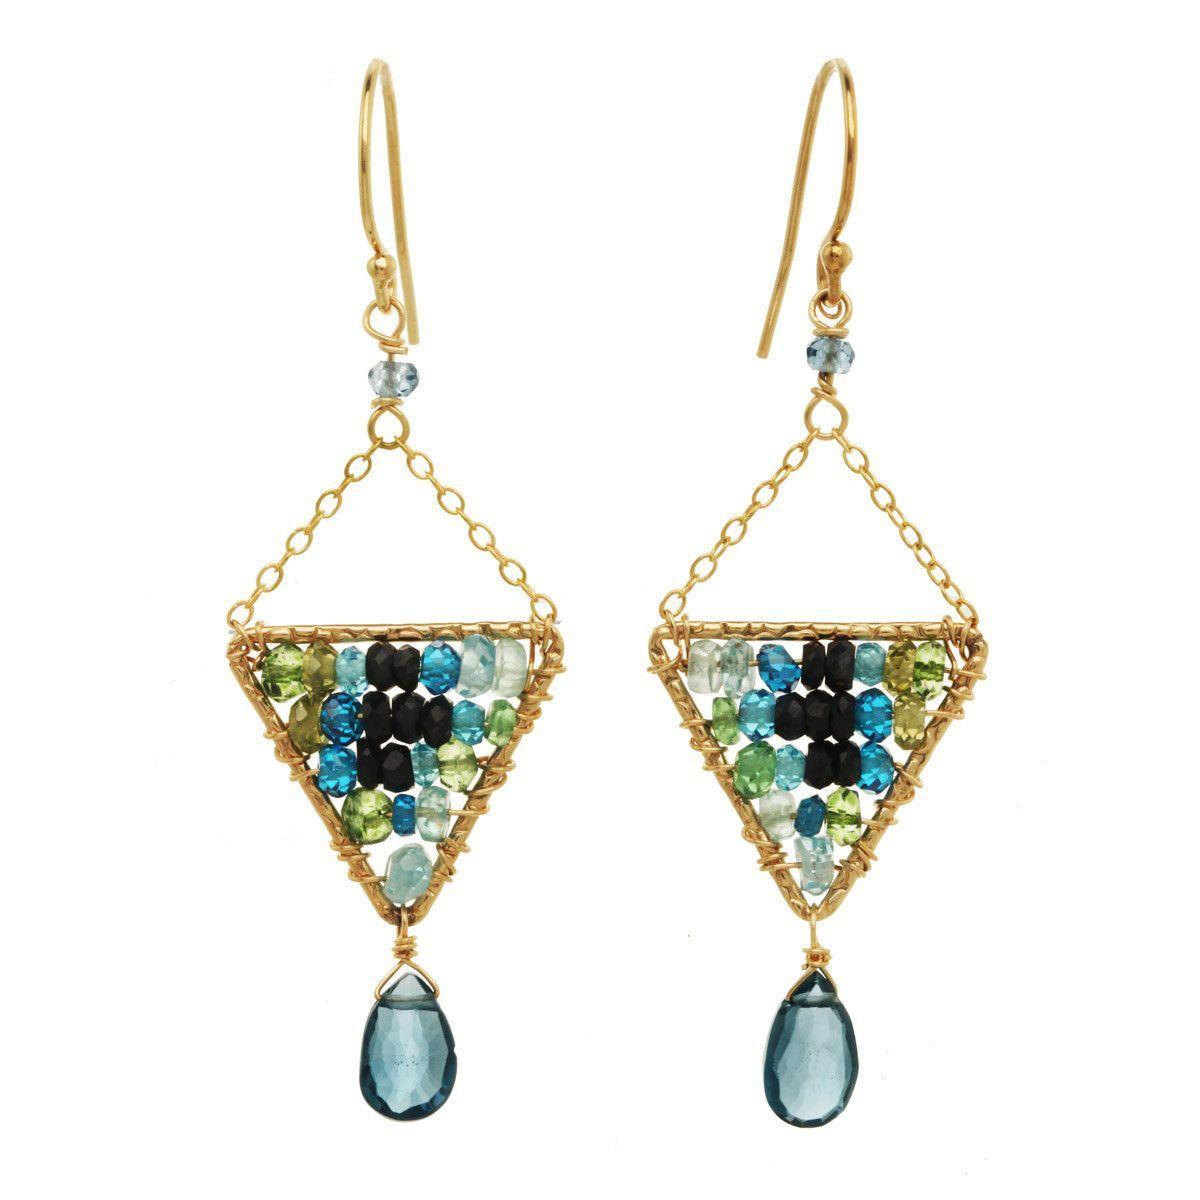 Labradorite and Blue Tourmaline Earrings 2911 by Michelle Pressler